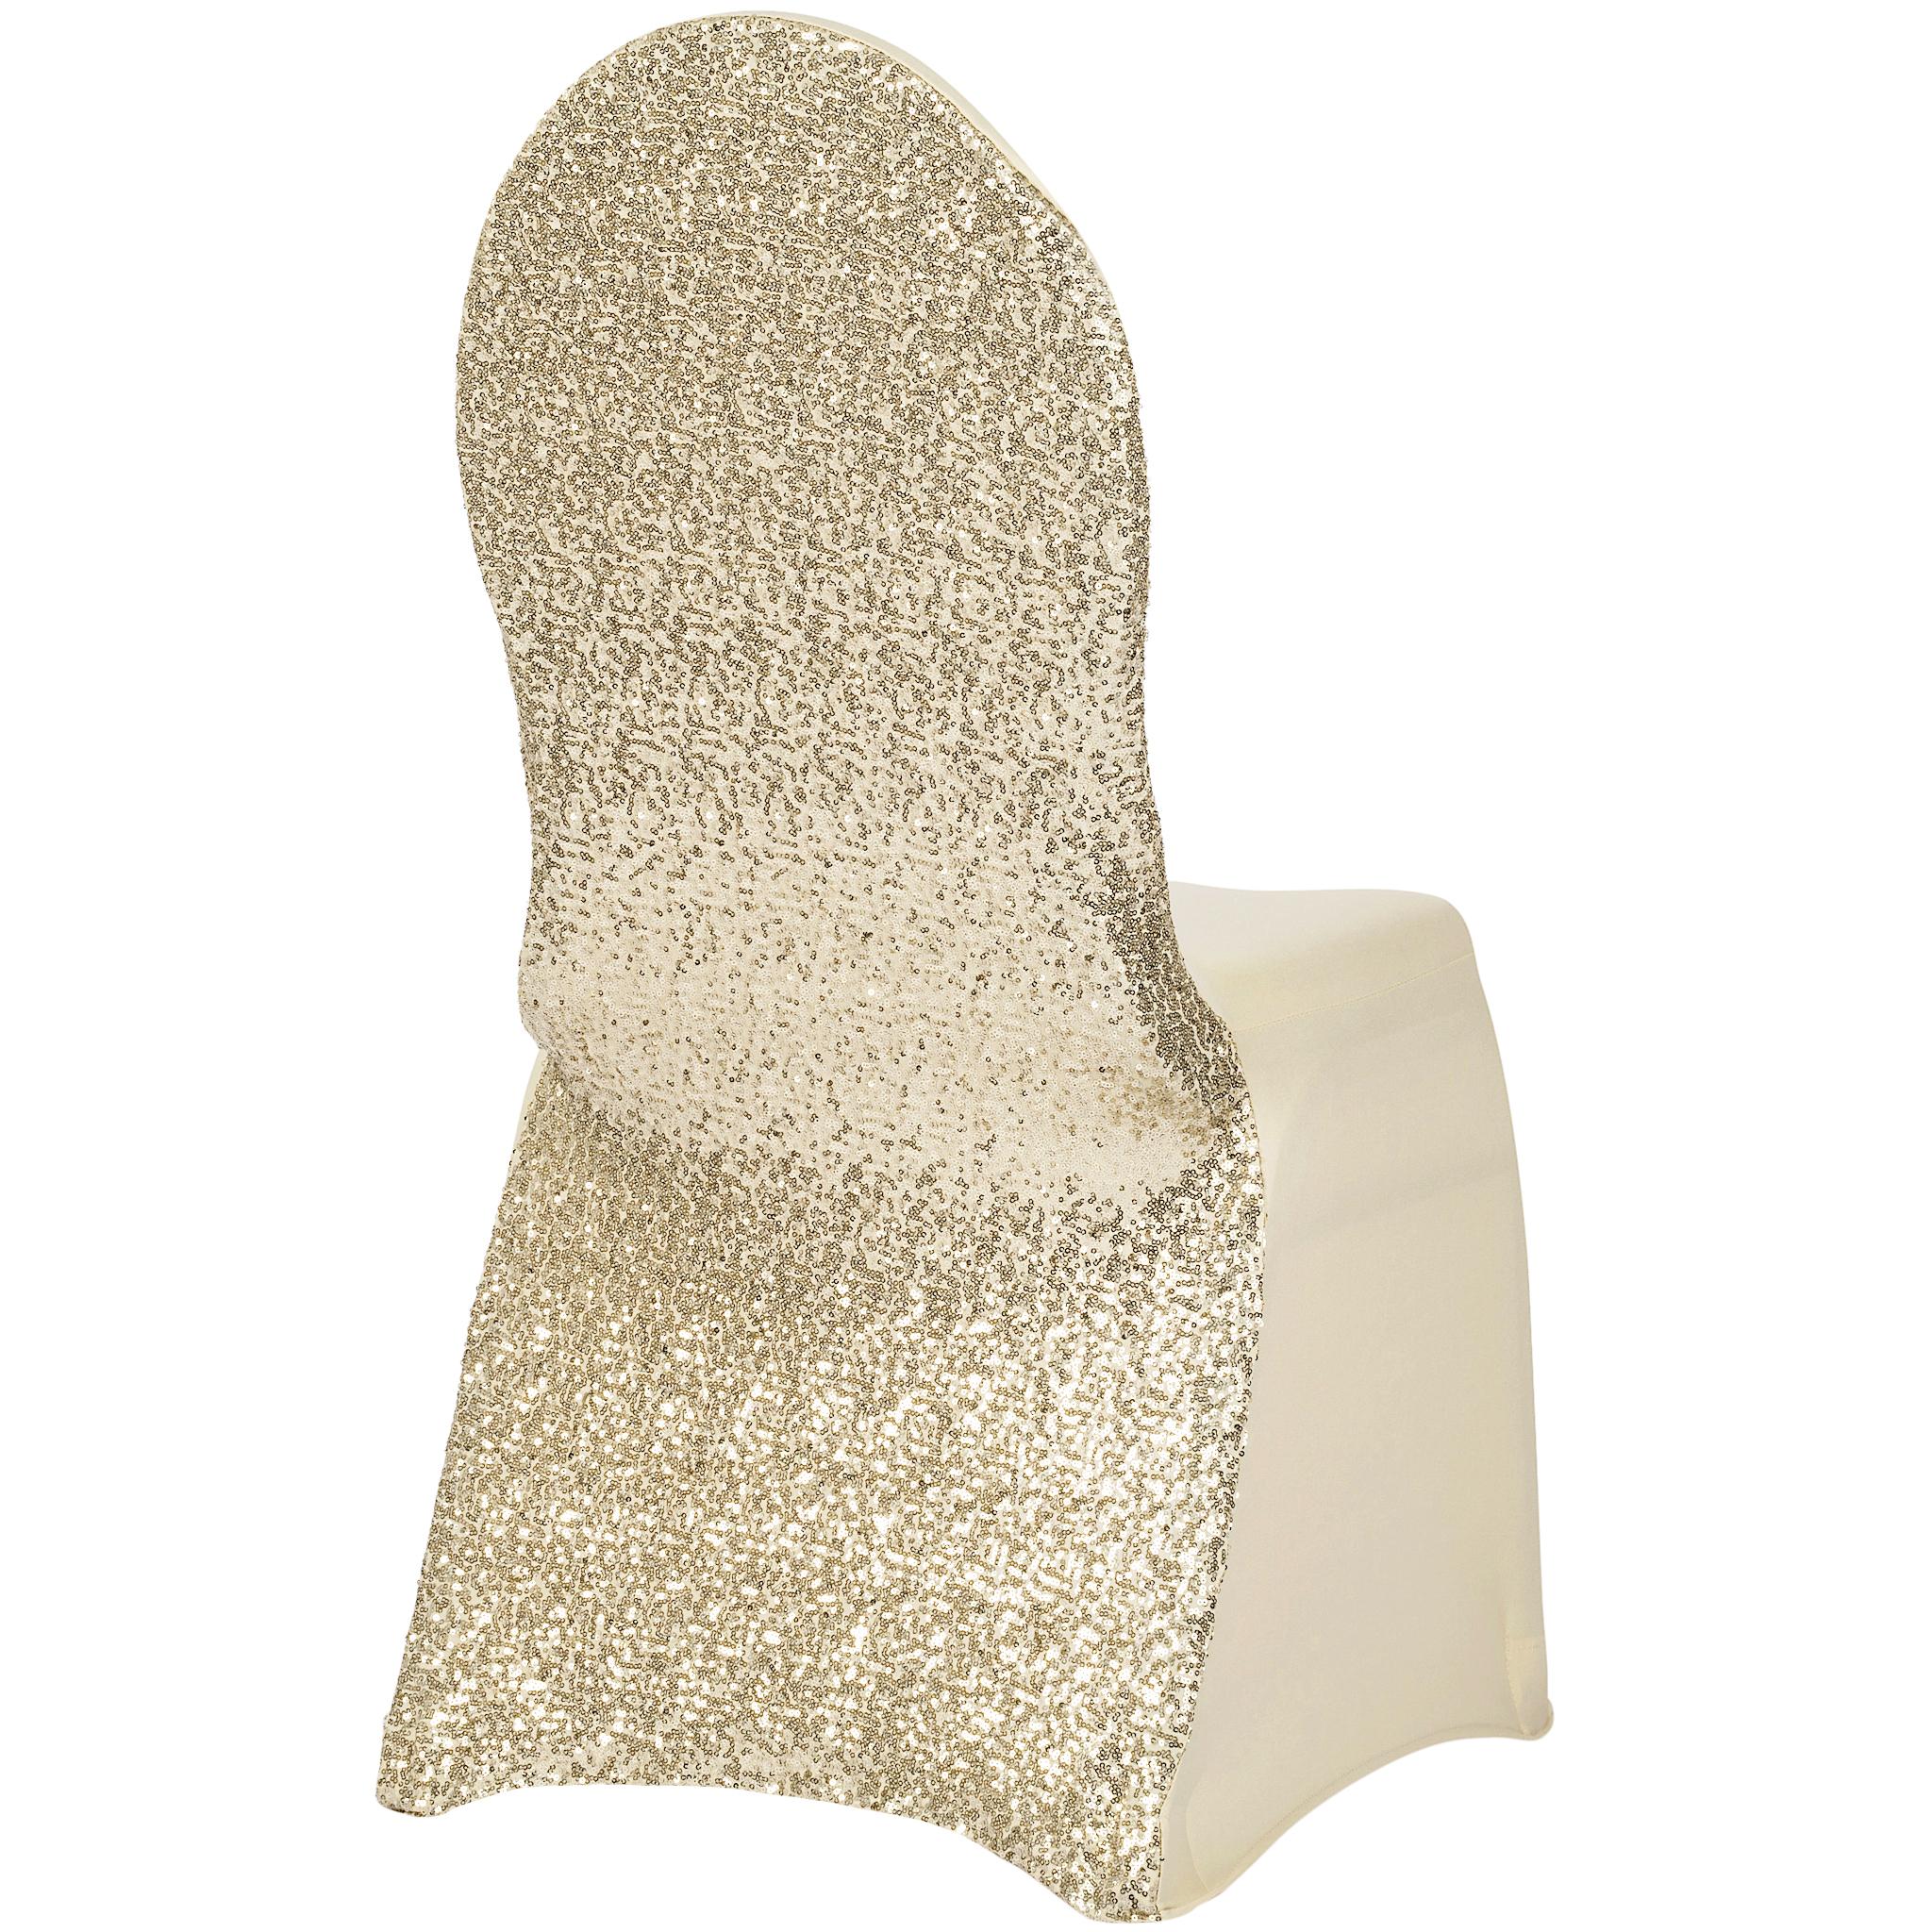 Glitz Sequin Stretch Spandex Banquet Chair Cover